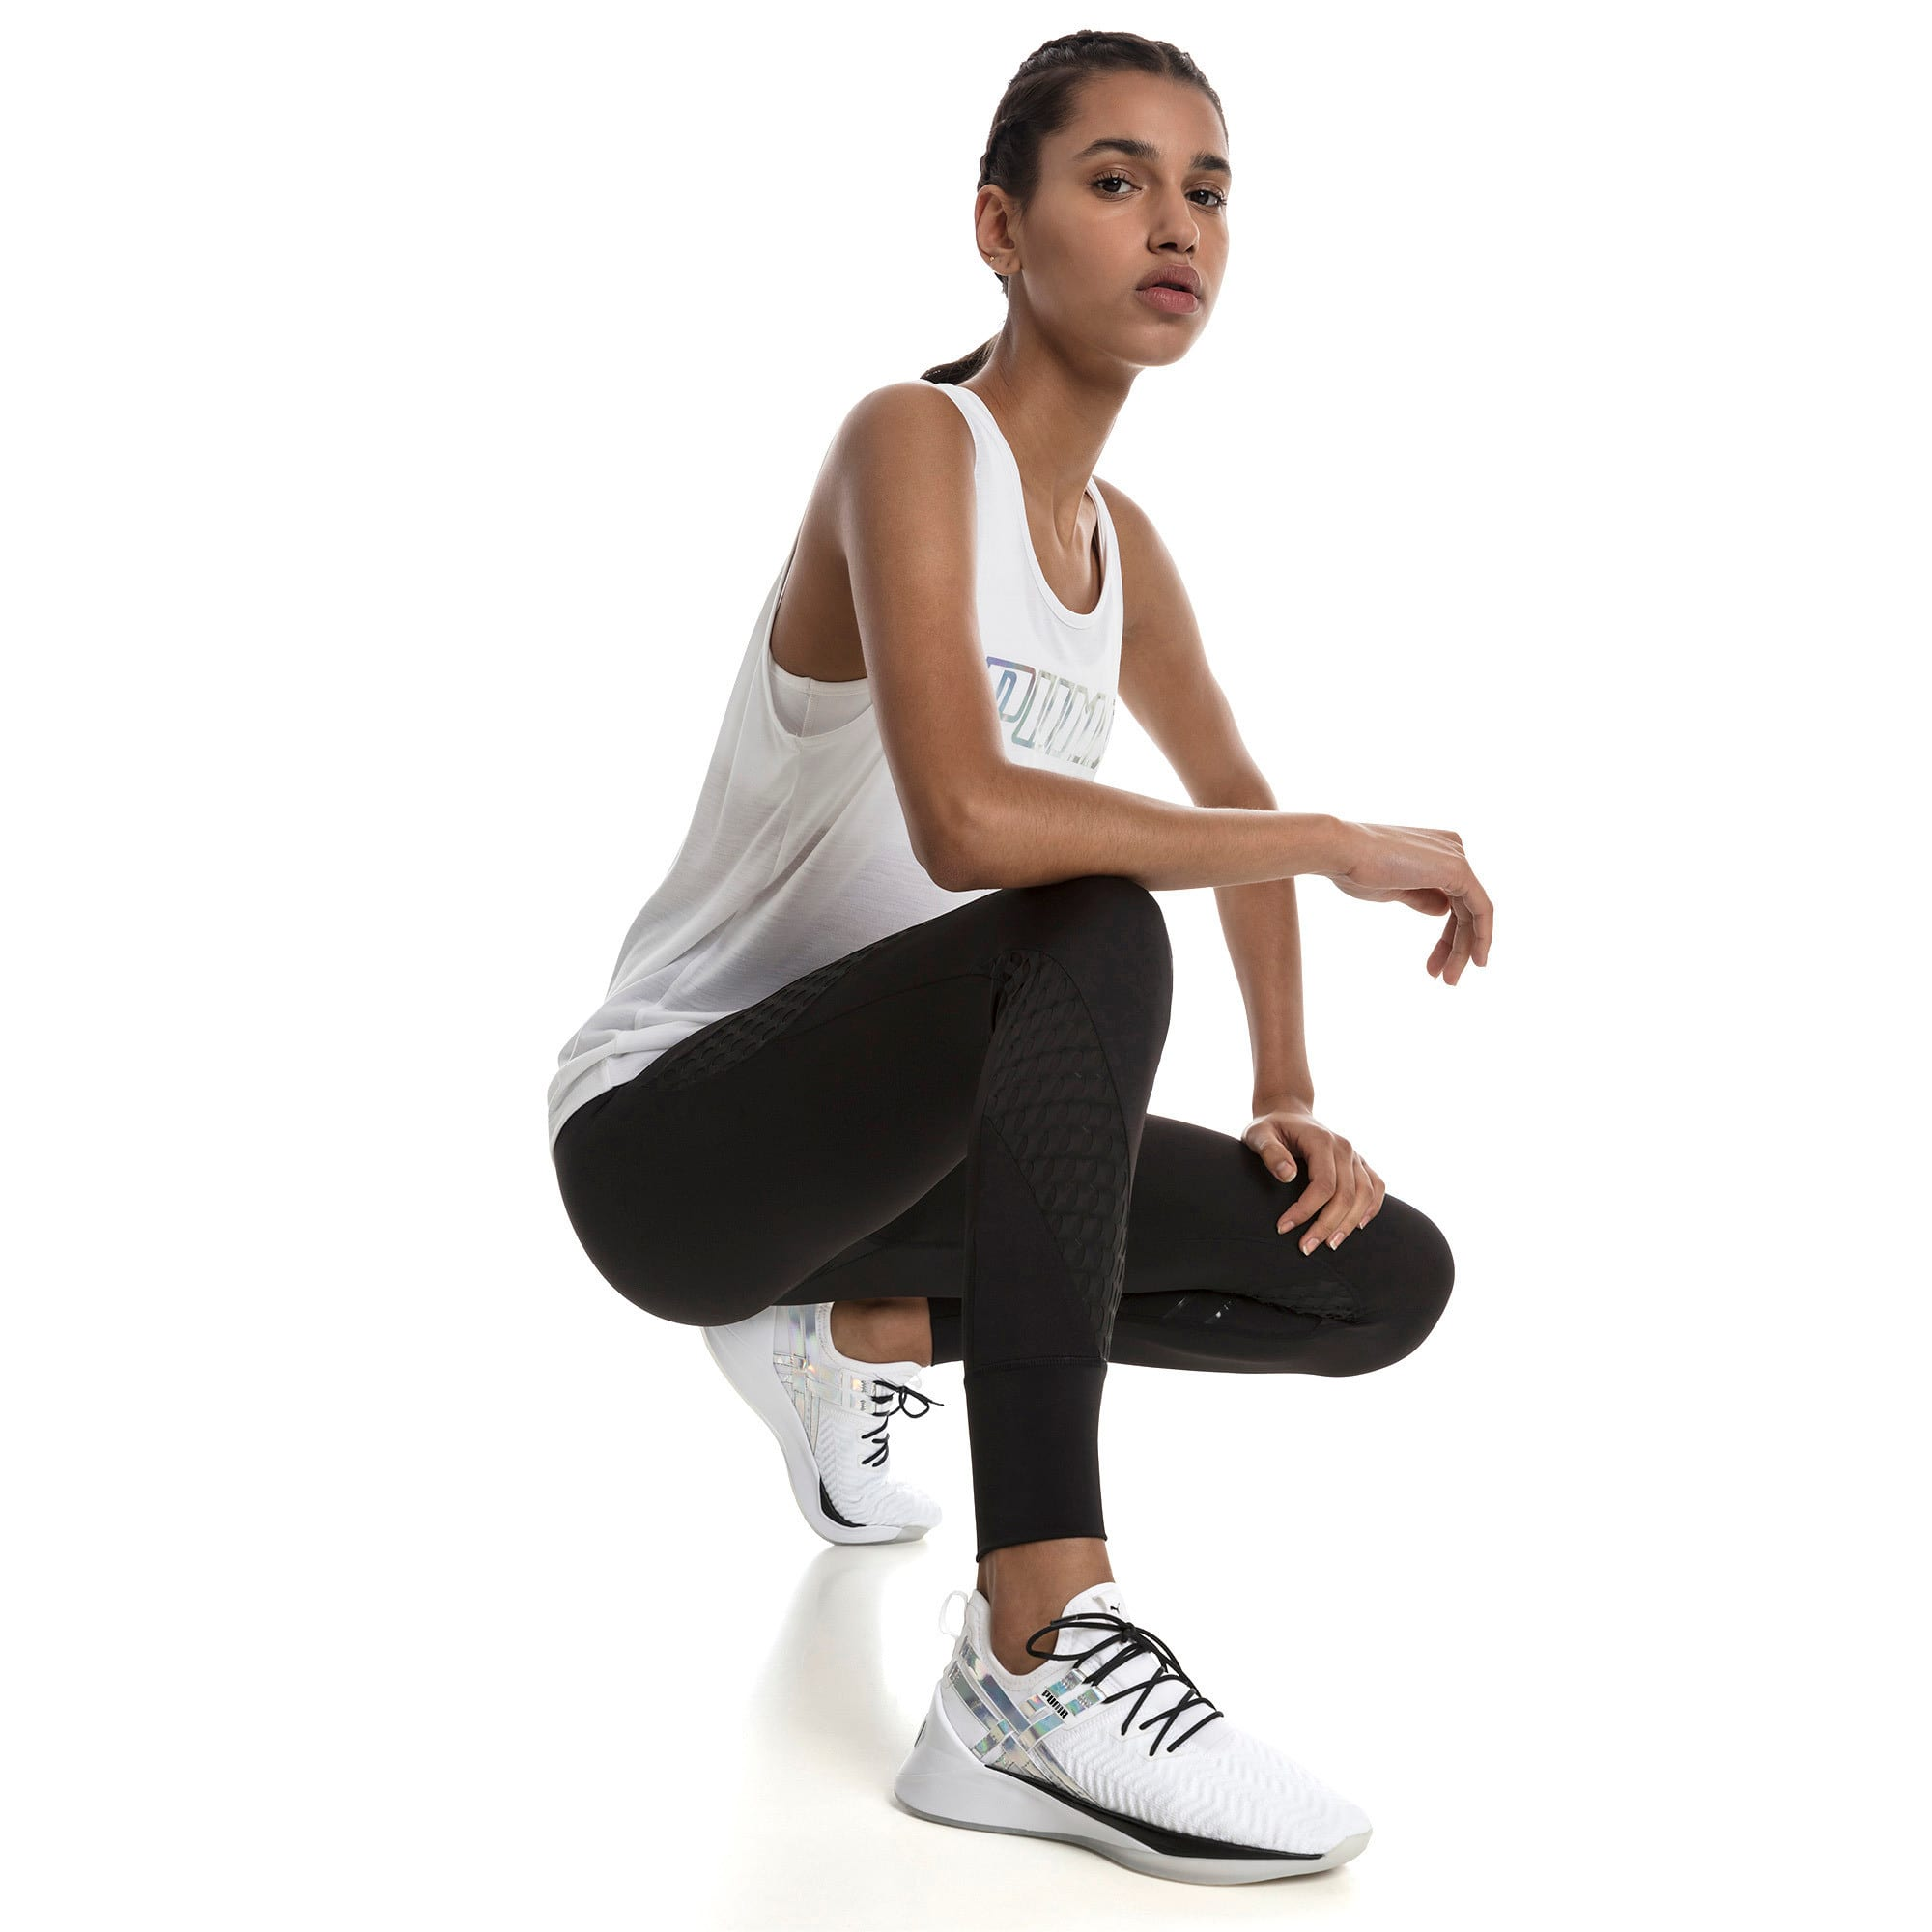 Thumbnail 3 of On the Brink Women's 7/8 Leggings, Puma Black, medium